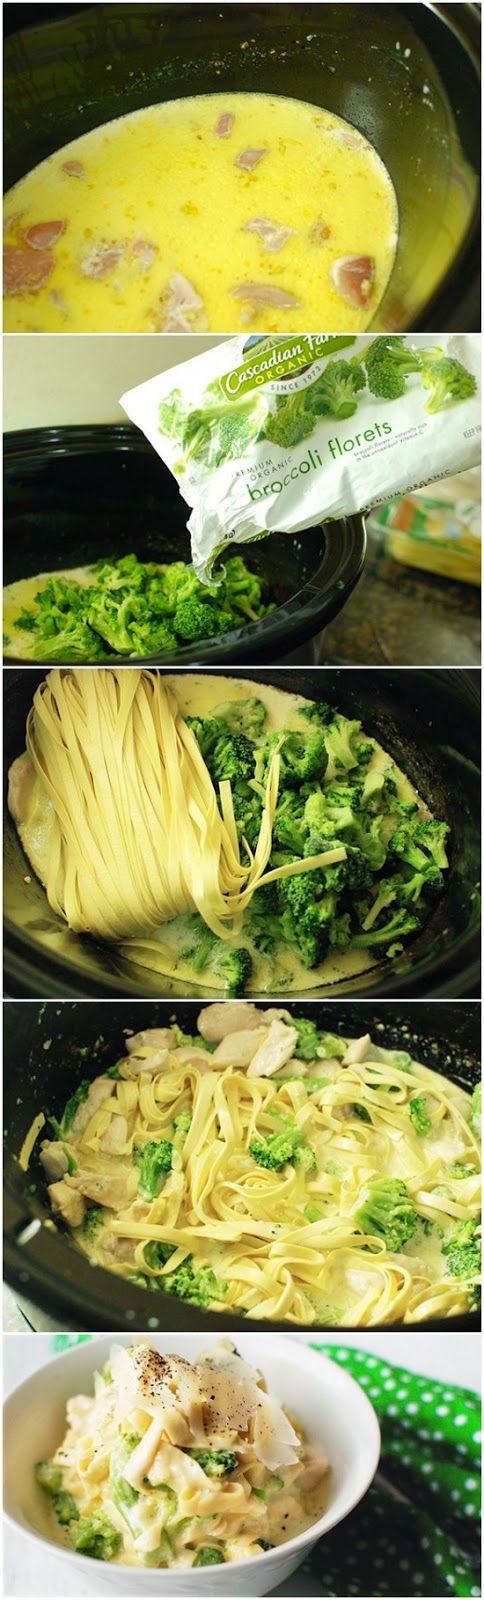 Spaghetti With Finite Onion Cream Chicken And Broccoli Espaguetis Con Cebolla Finita Nata Pollo Y Brócoli Subido De Comida Comida Postres Recetas De Comida